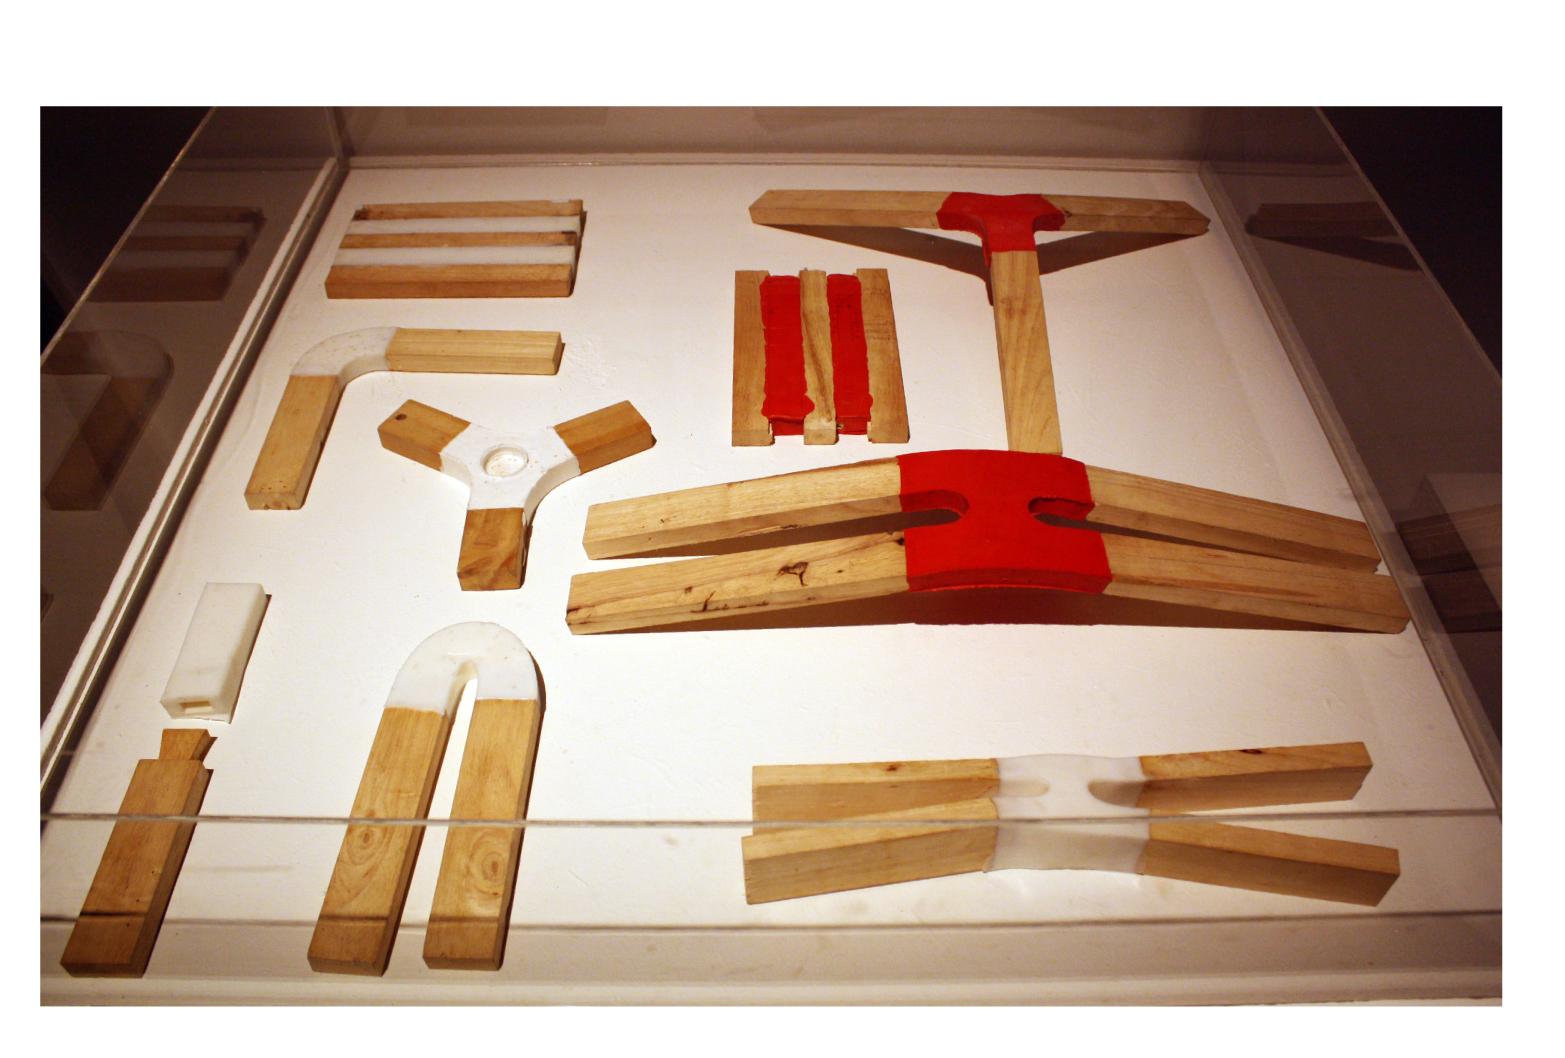 Flexi Wood Joint Chanan Tassana